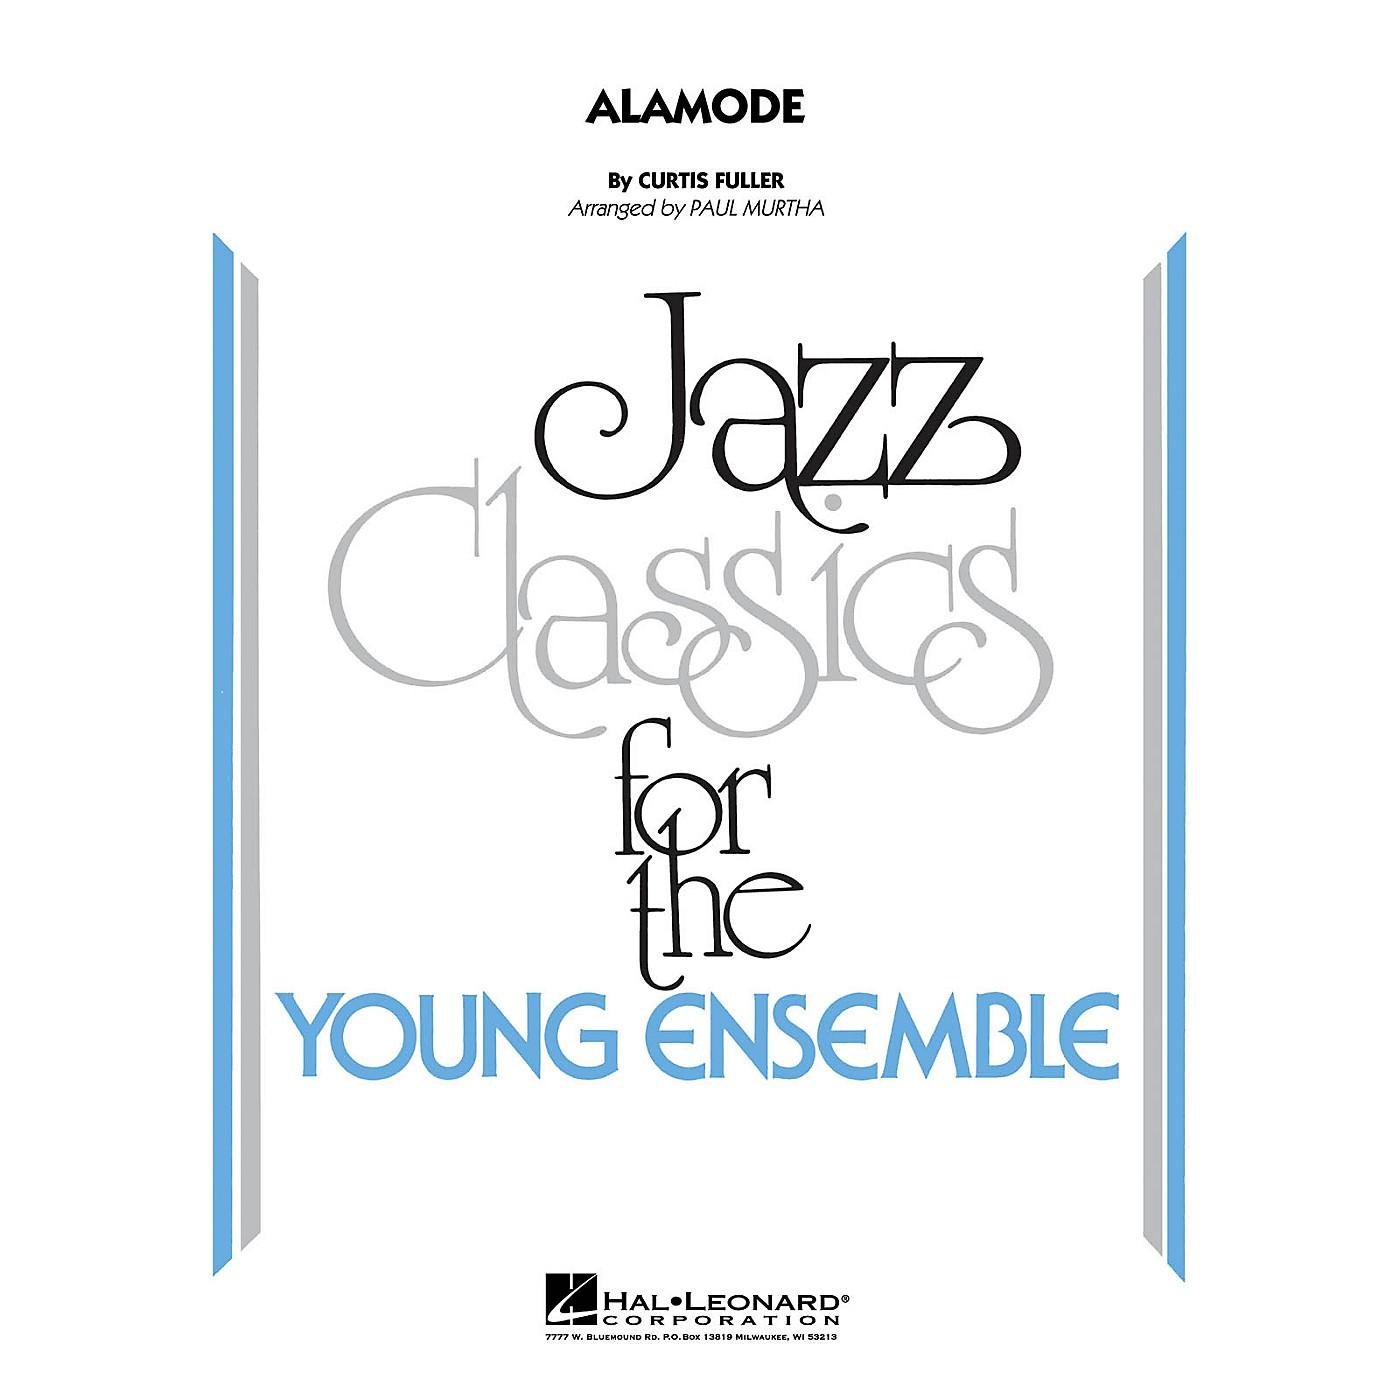 Hal Leonard Alamode Jazz Band Level 3 Arranged by Paul Murtha thumbnail